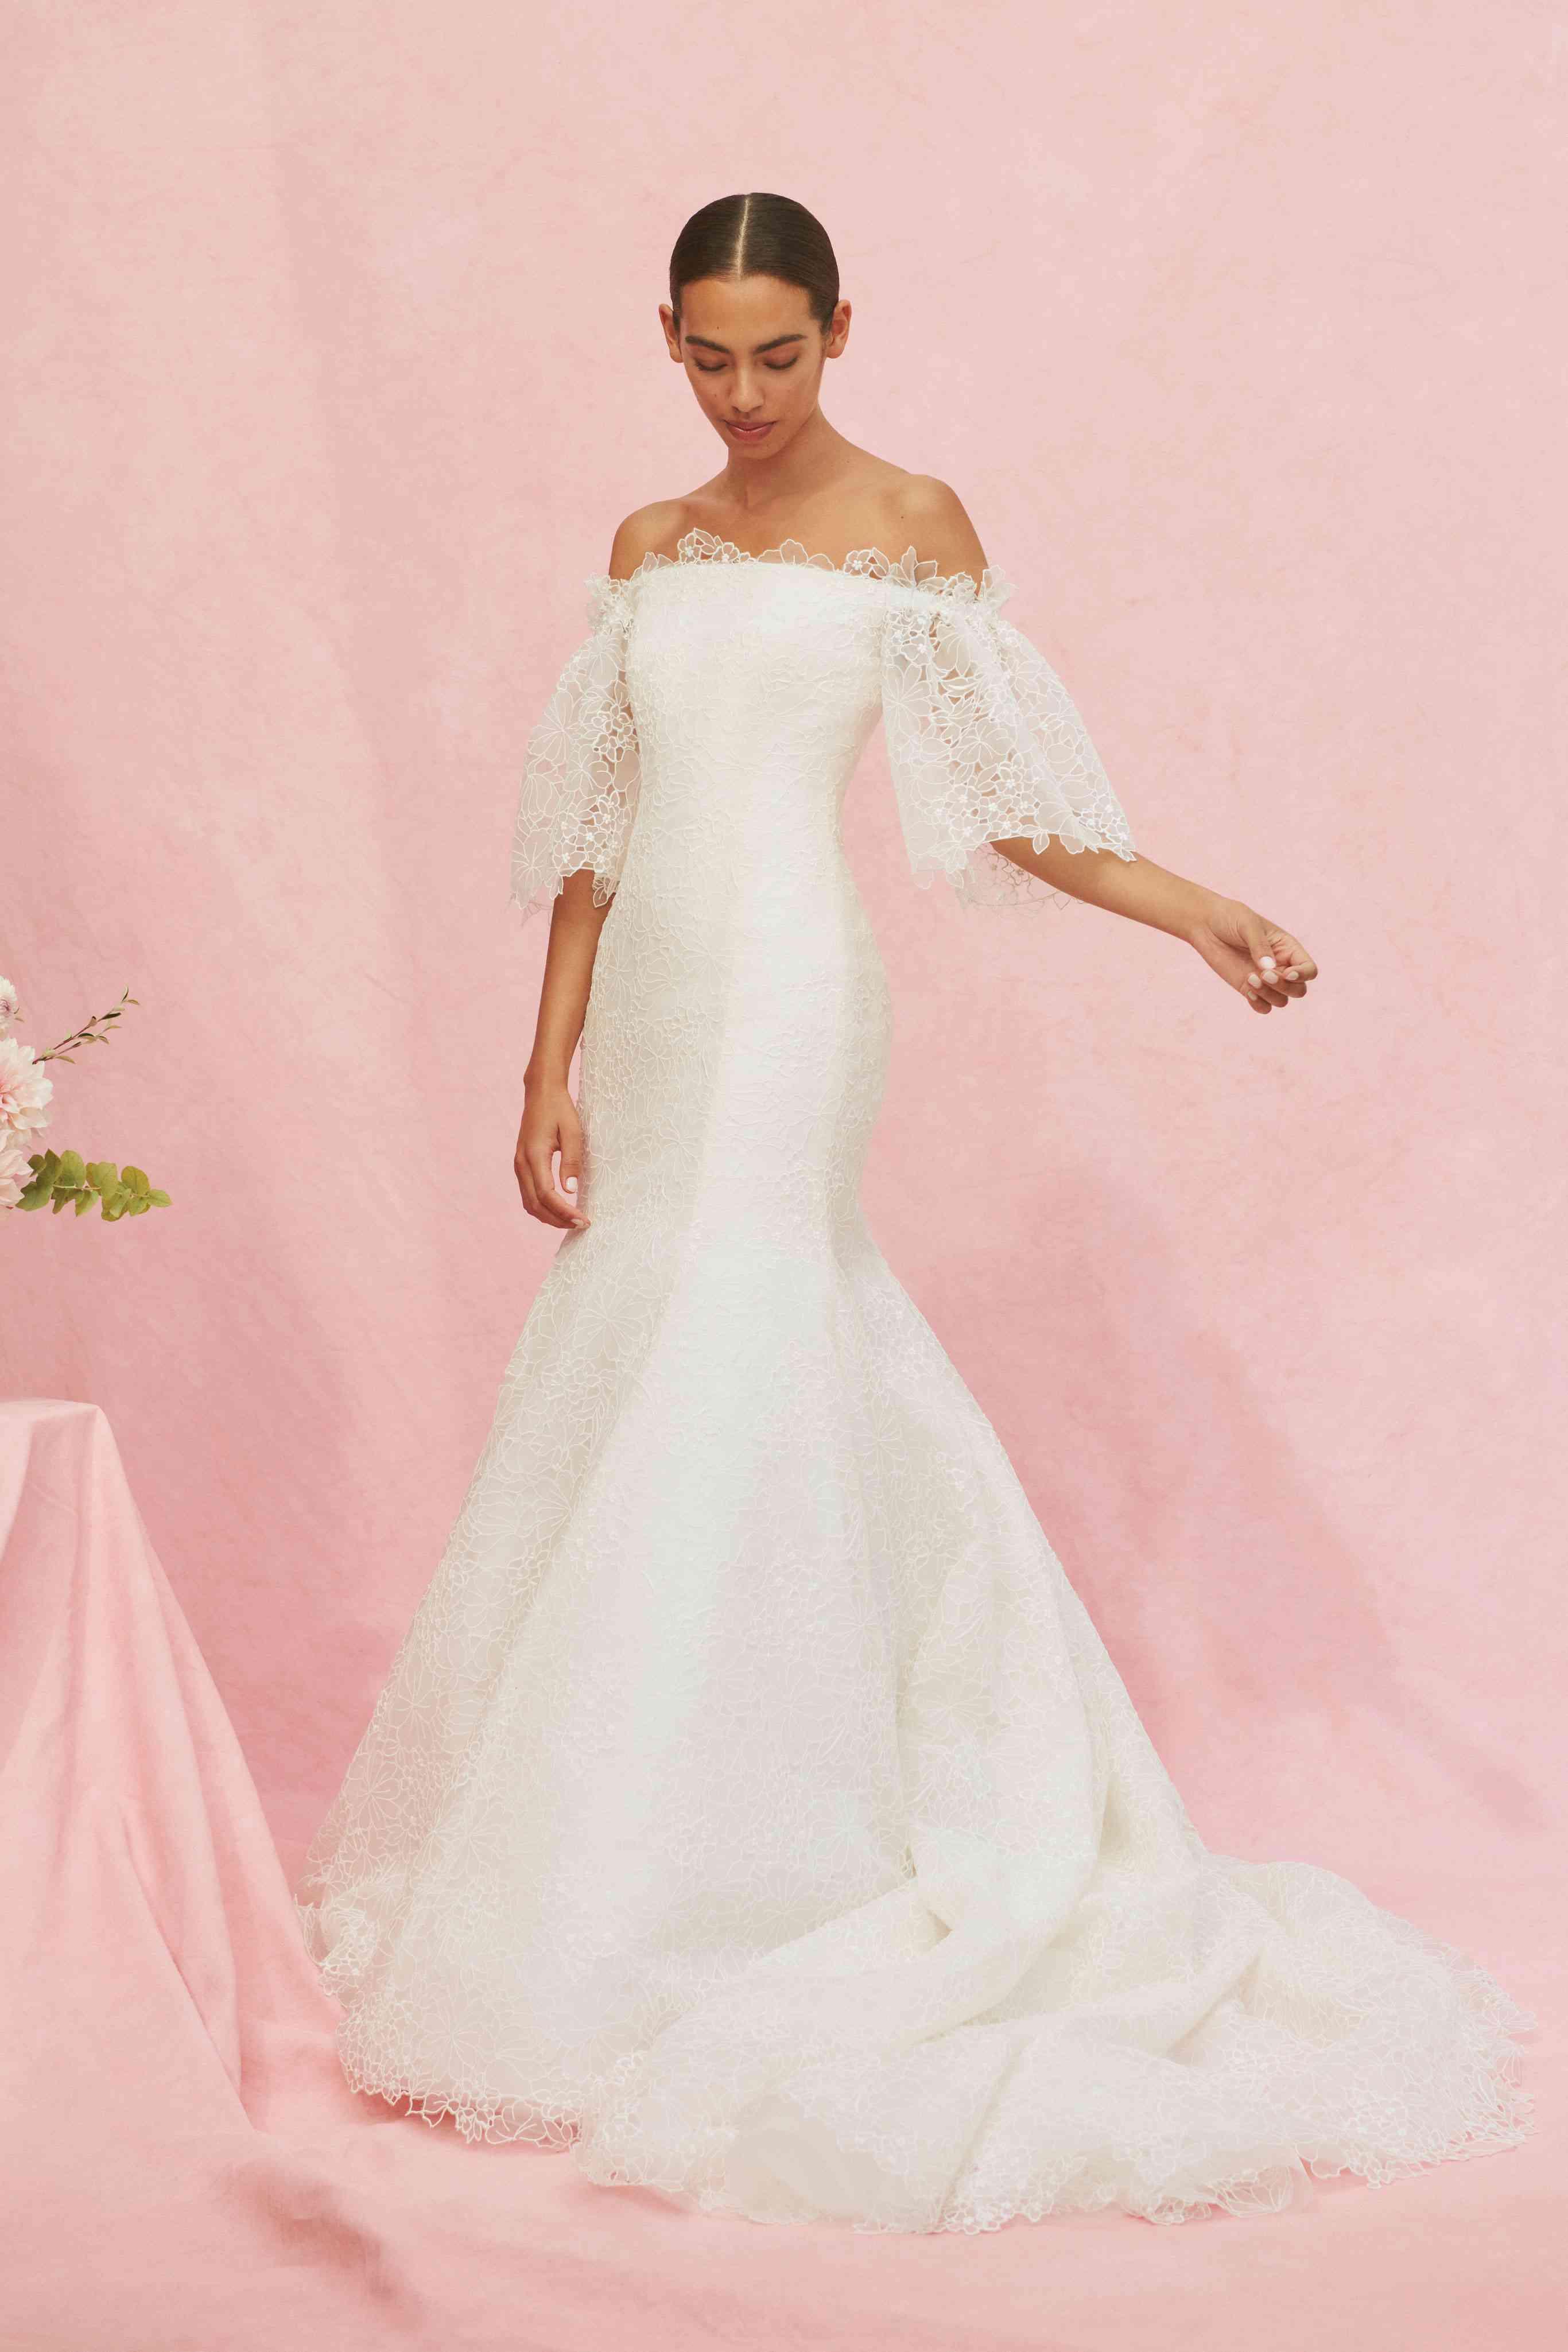 Carolina Herrera Bridal Wedding Dress Collection Fall 2020